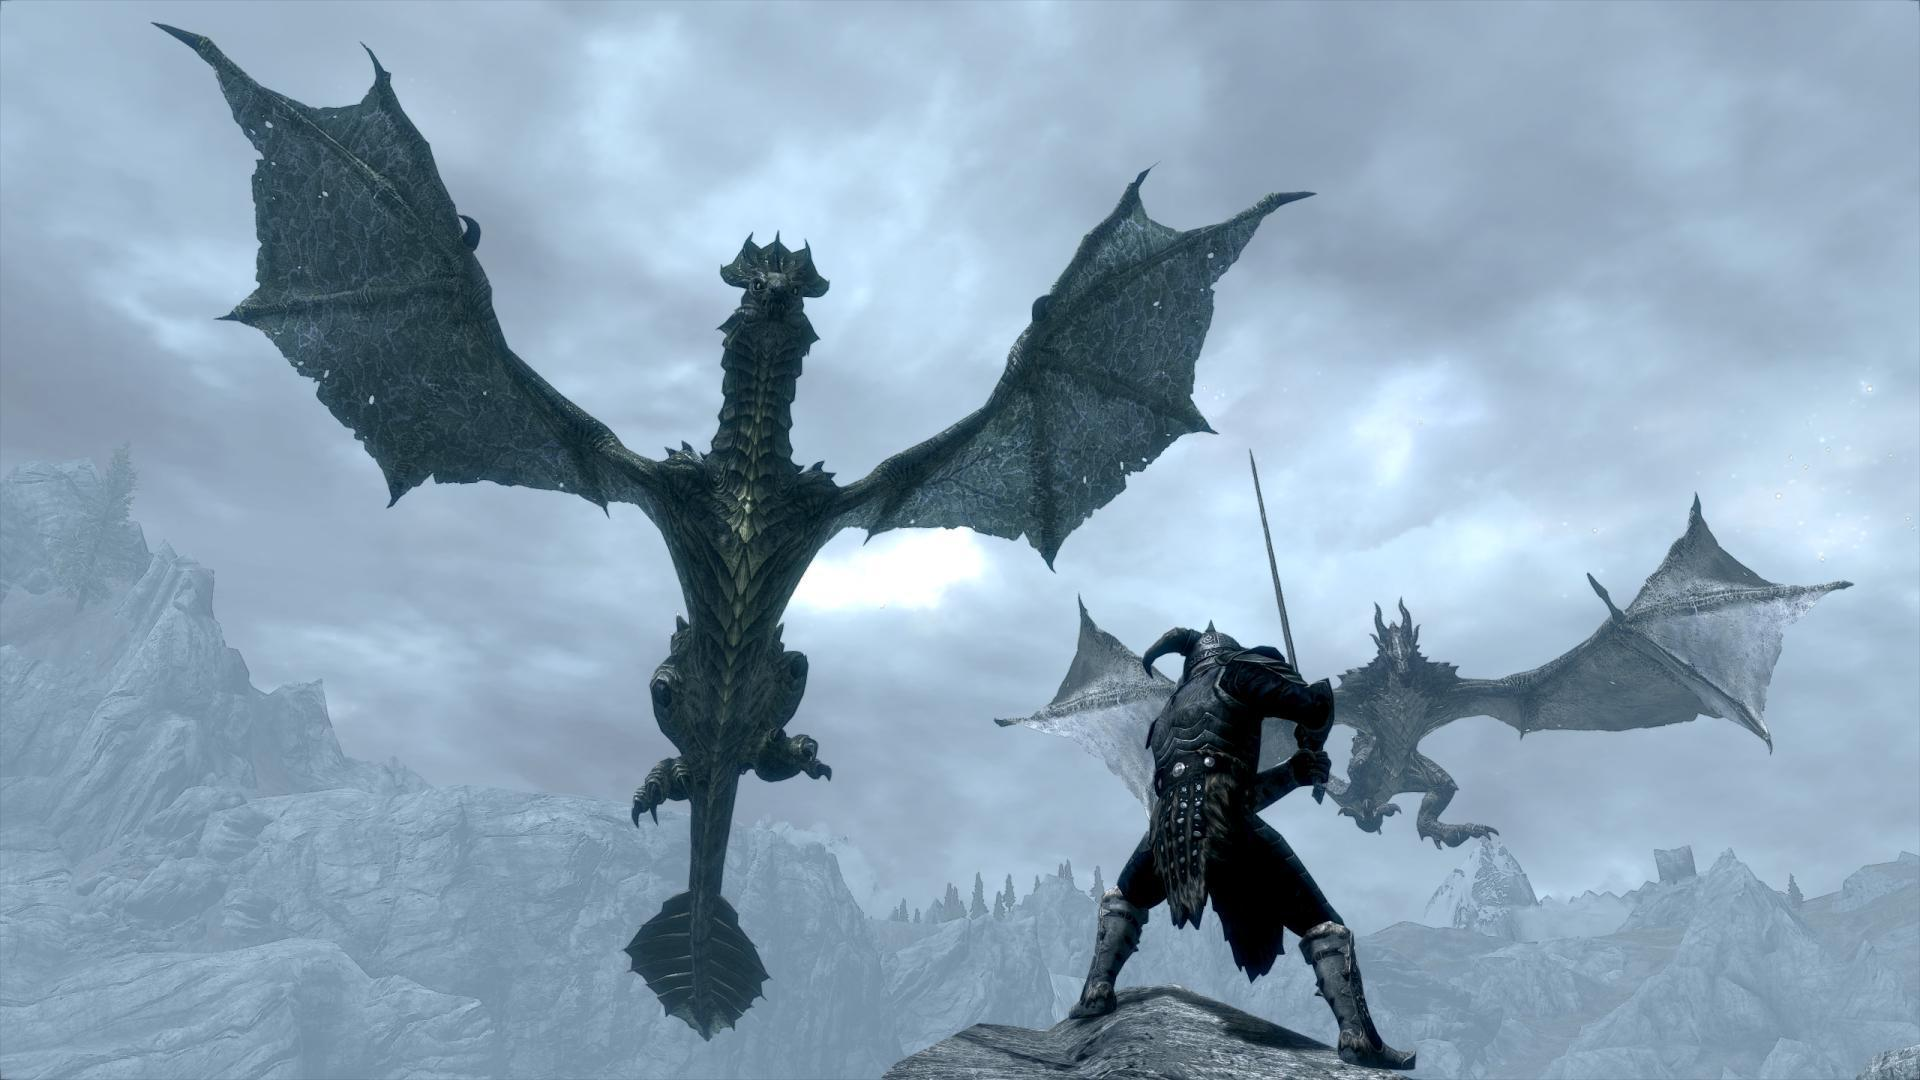 Skyrim Dragon: Skyrim Wallpapers 1080p